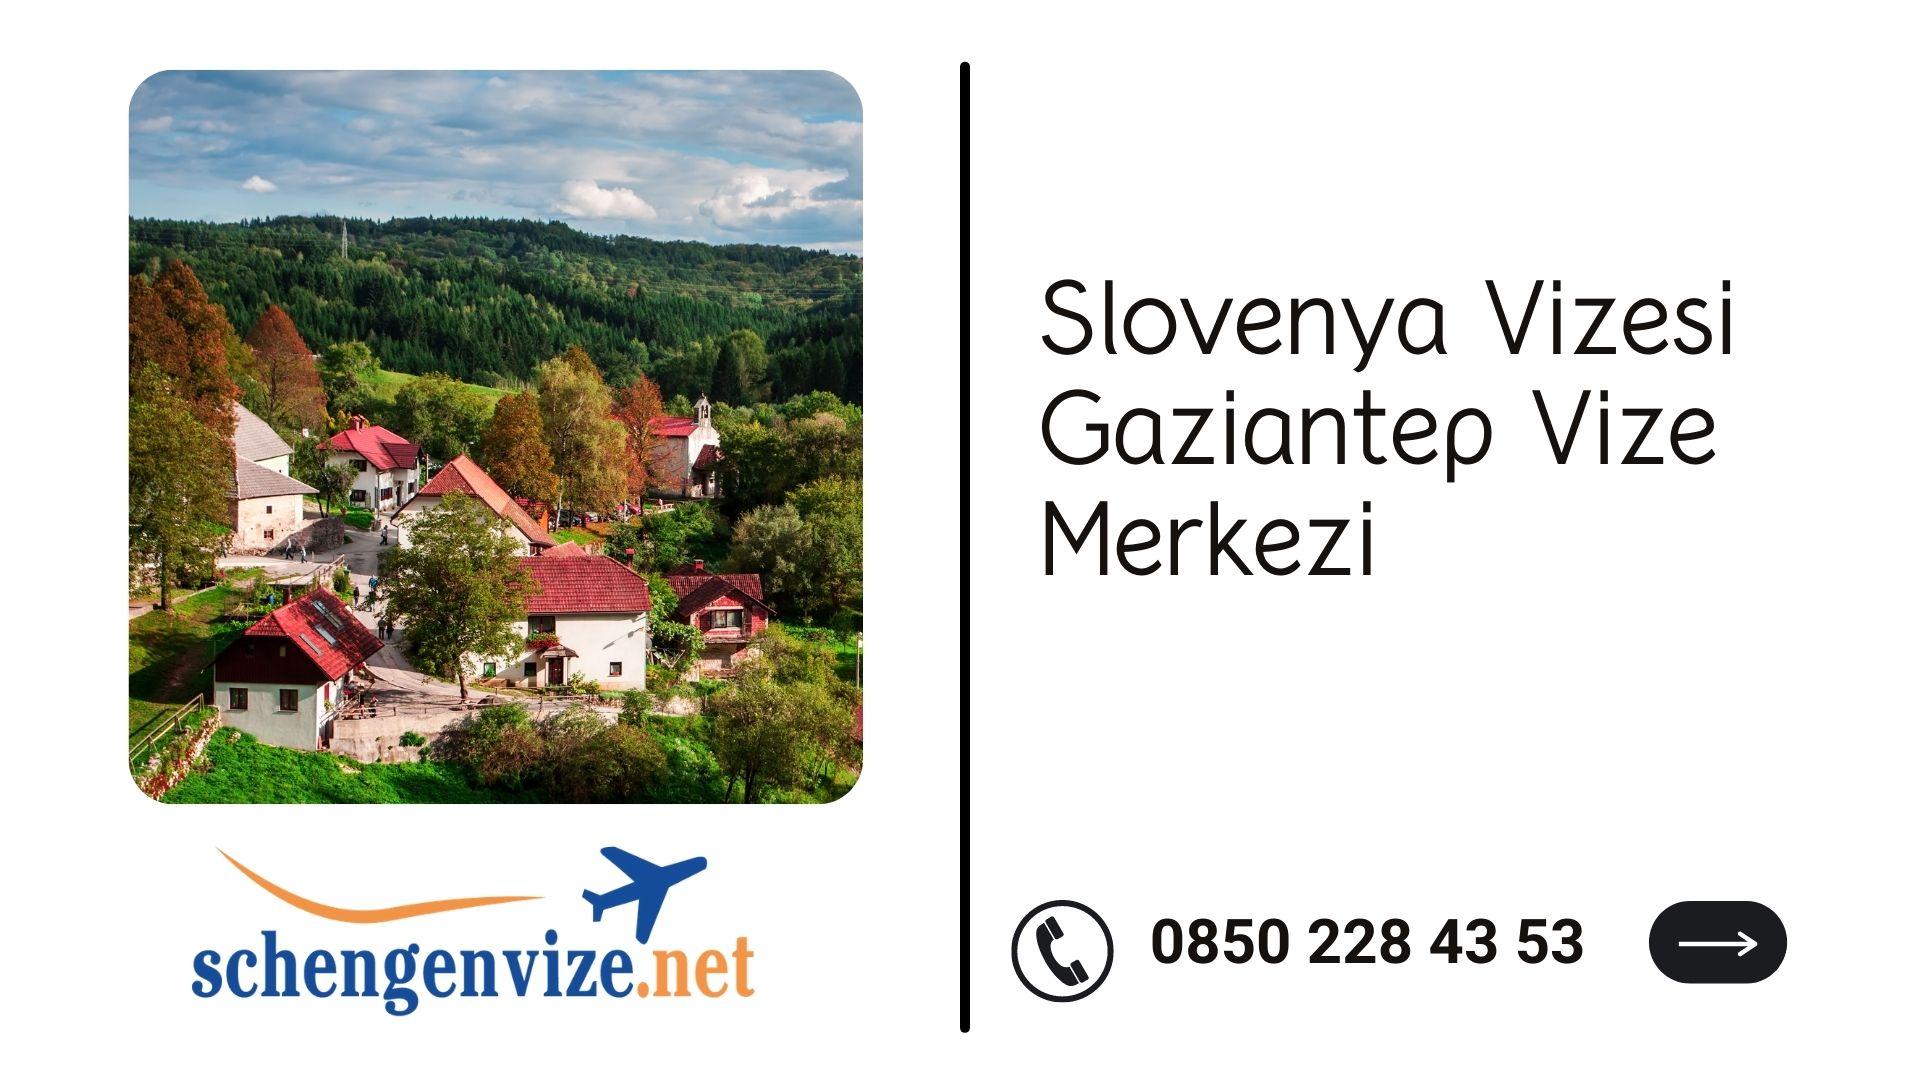 Slovenya Vizesi Gaziantep Vize Merkezi